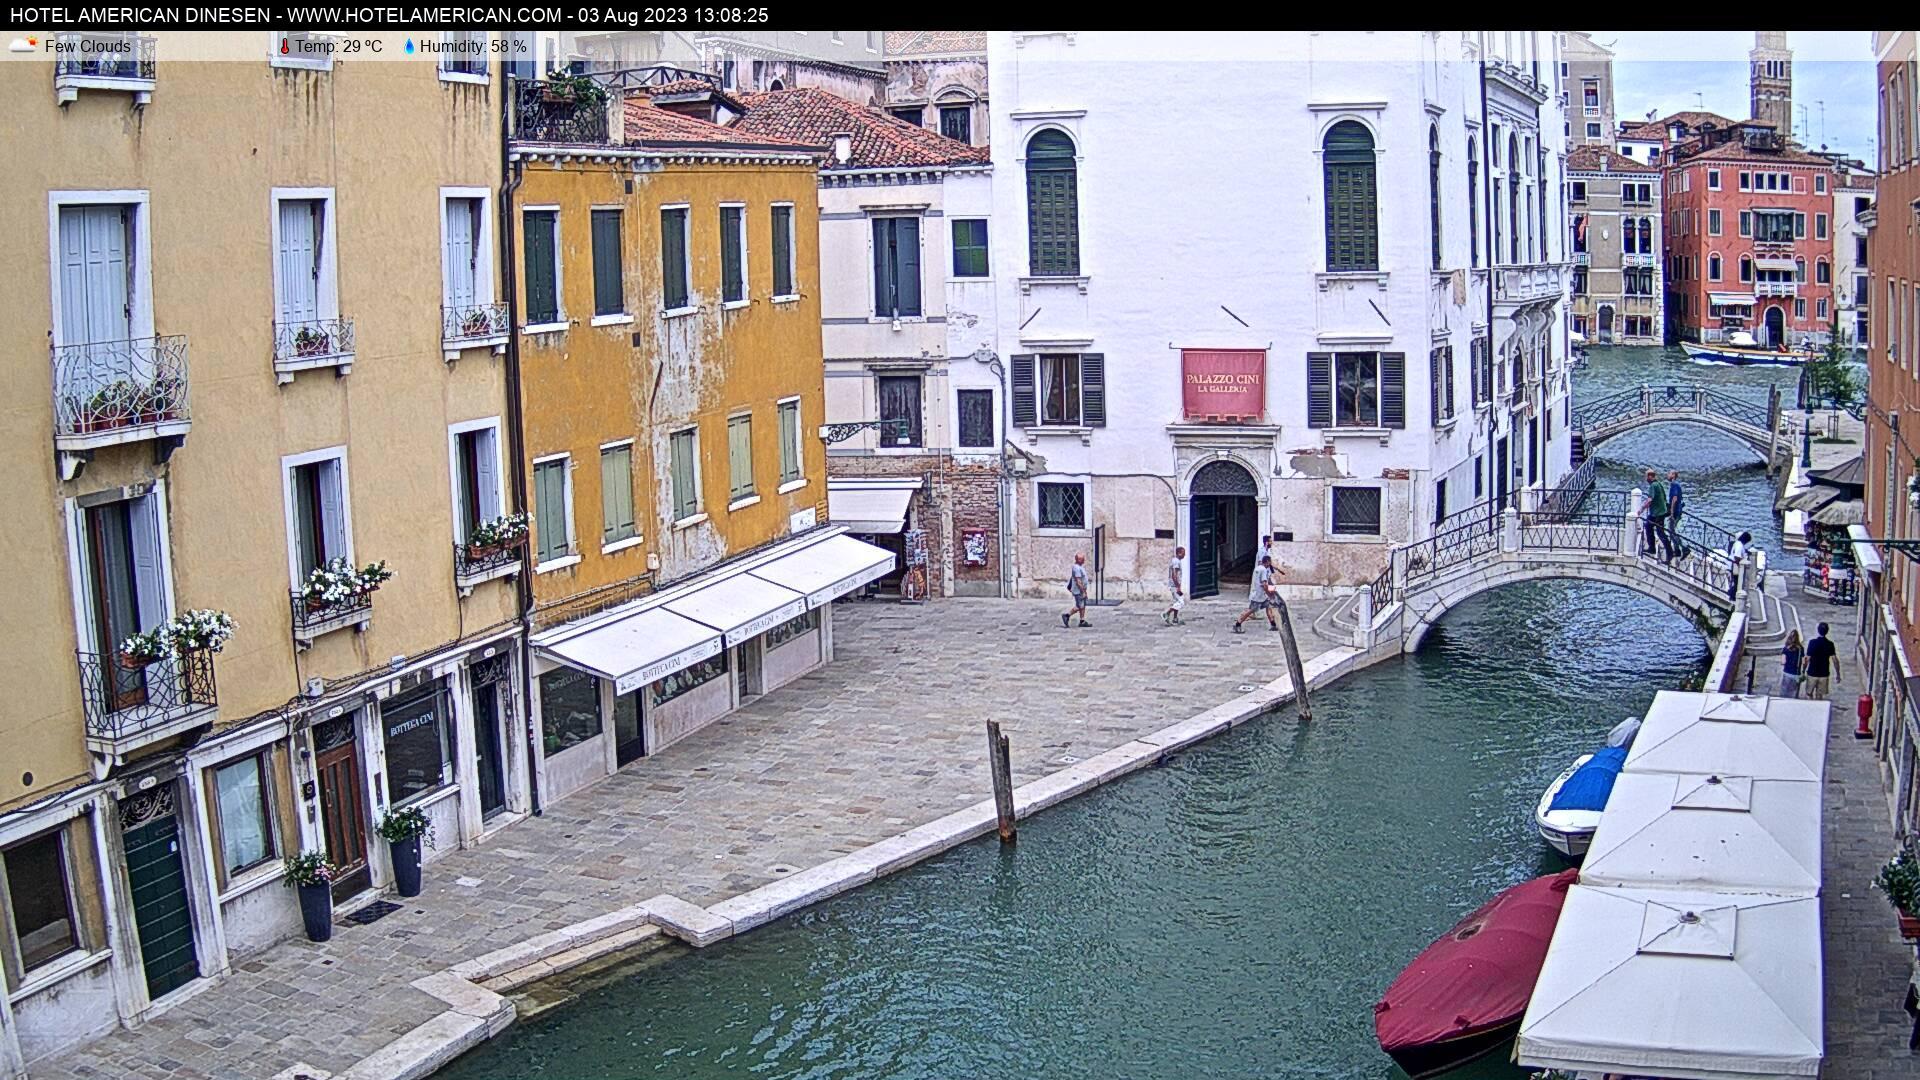 Venedig Sa. 13:08